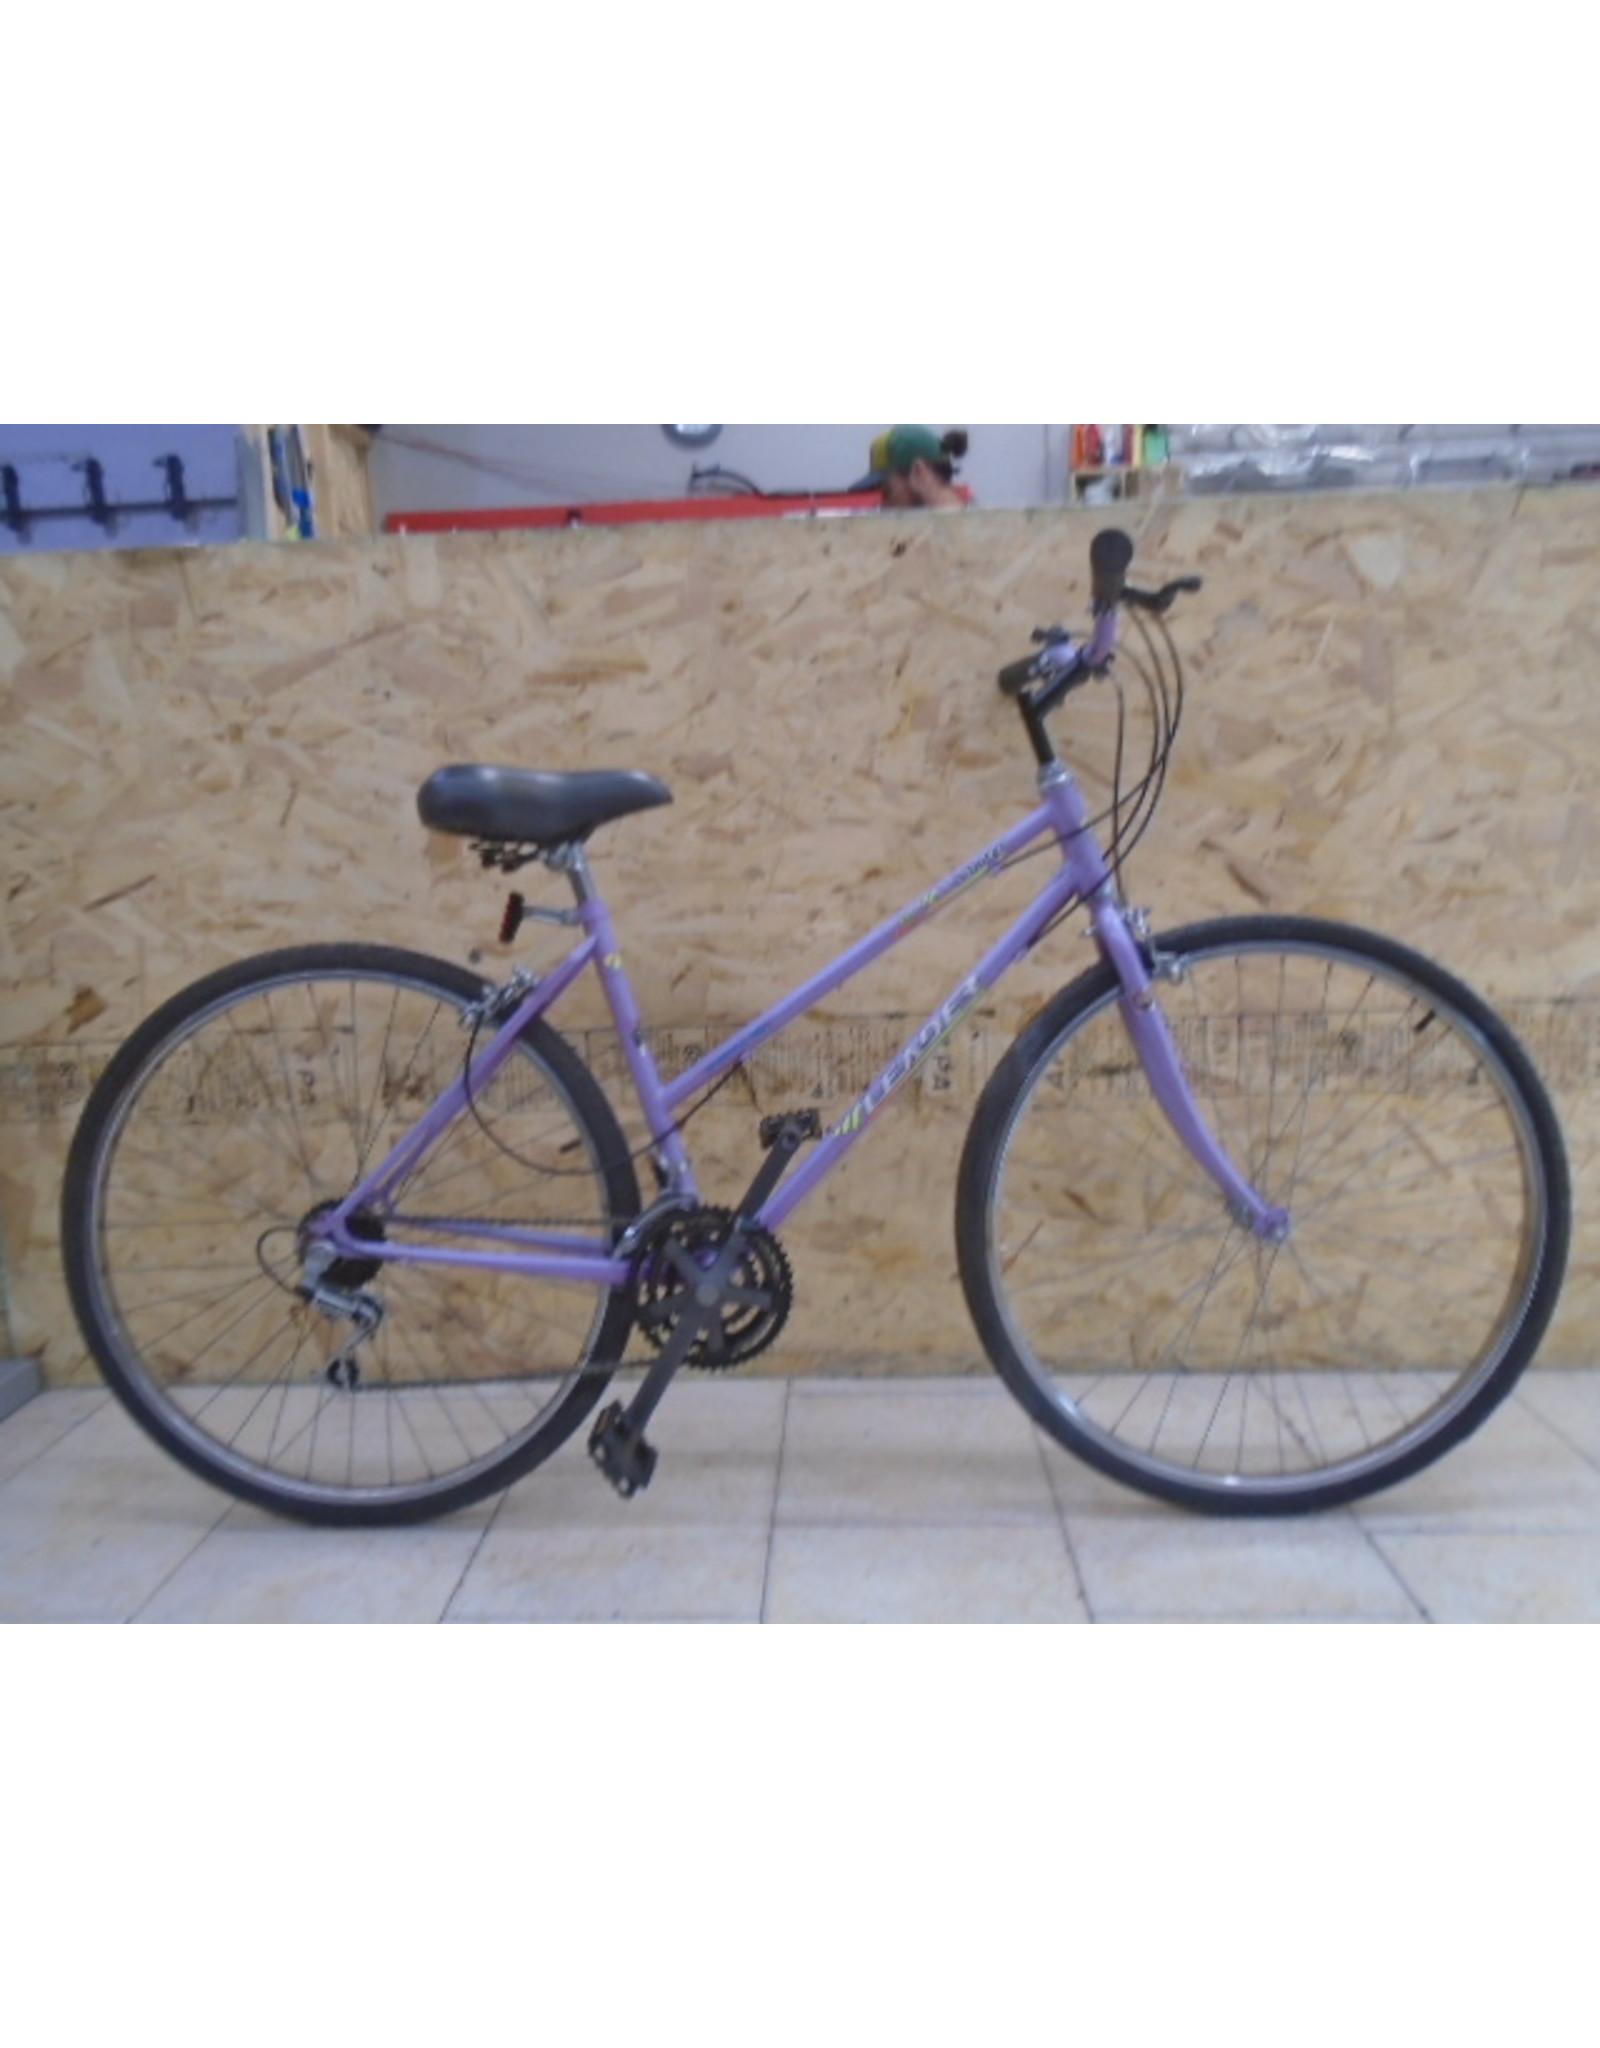 "Vélo usagé hybride Leader 18"" - 9997"